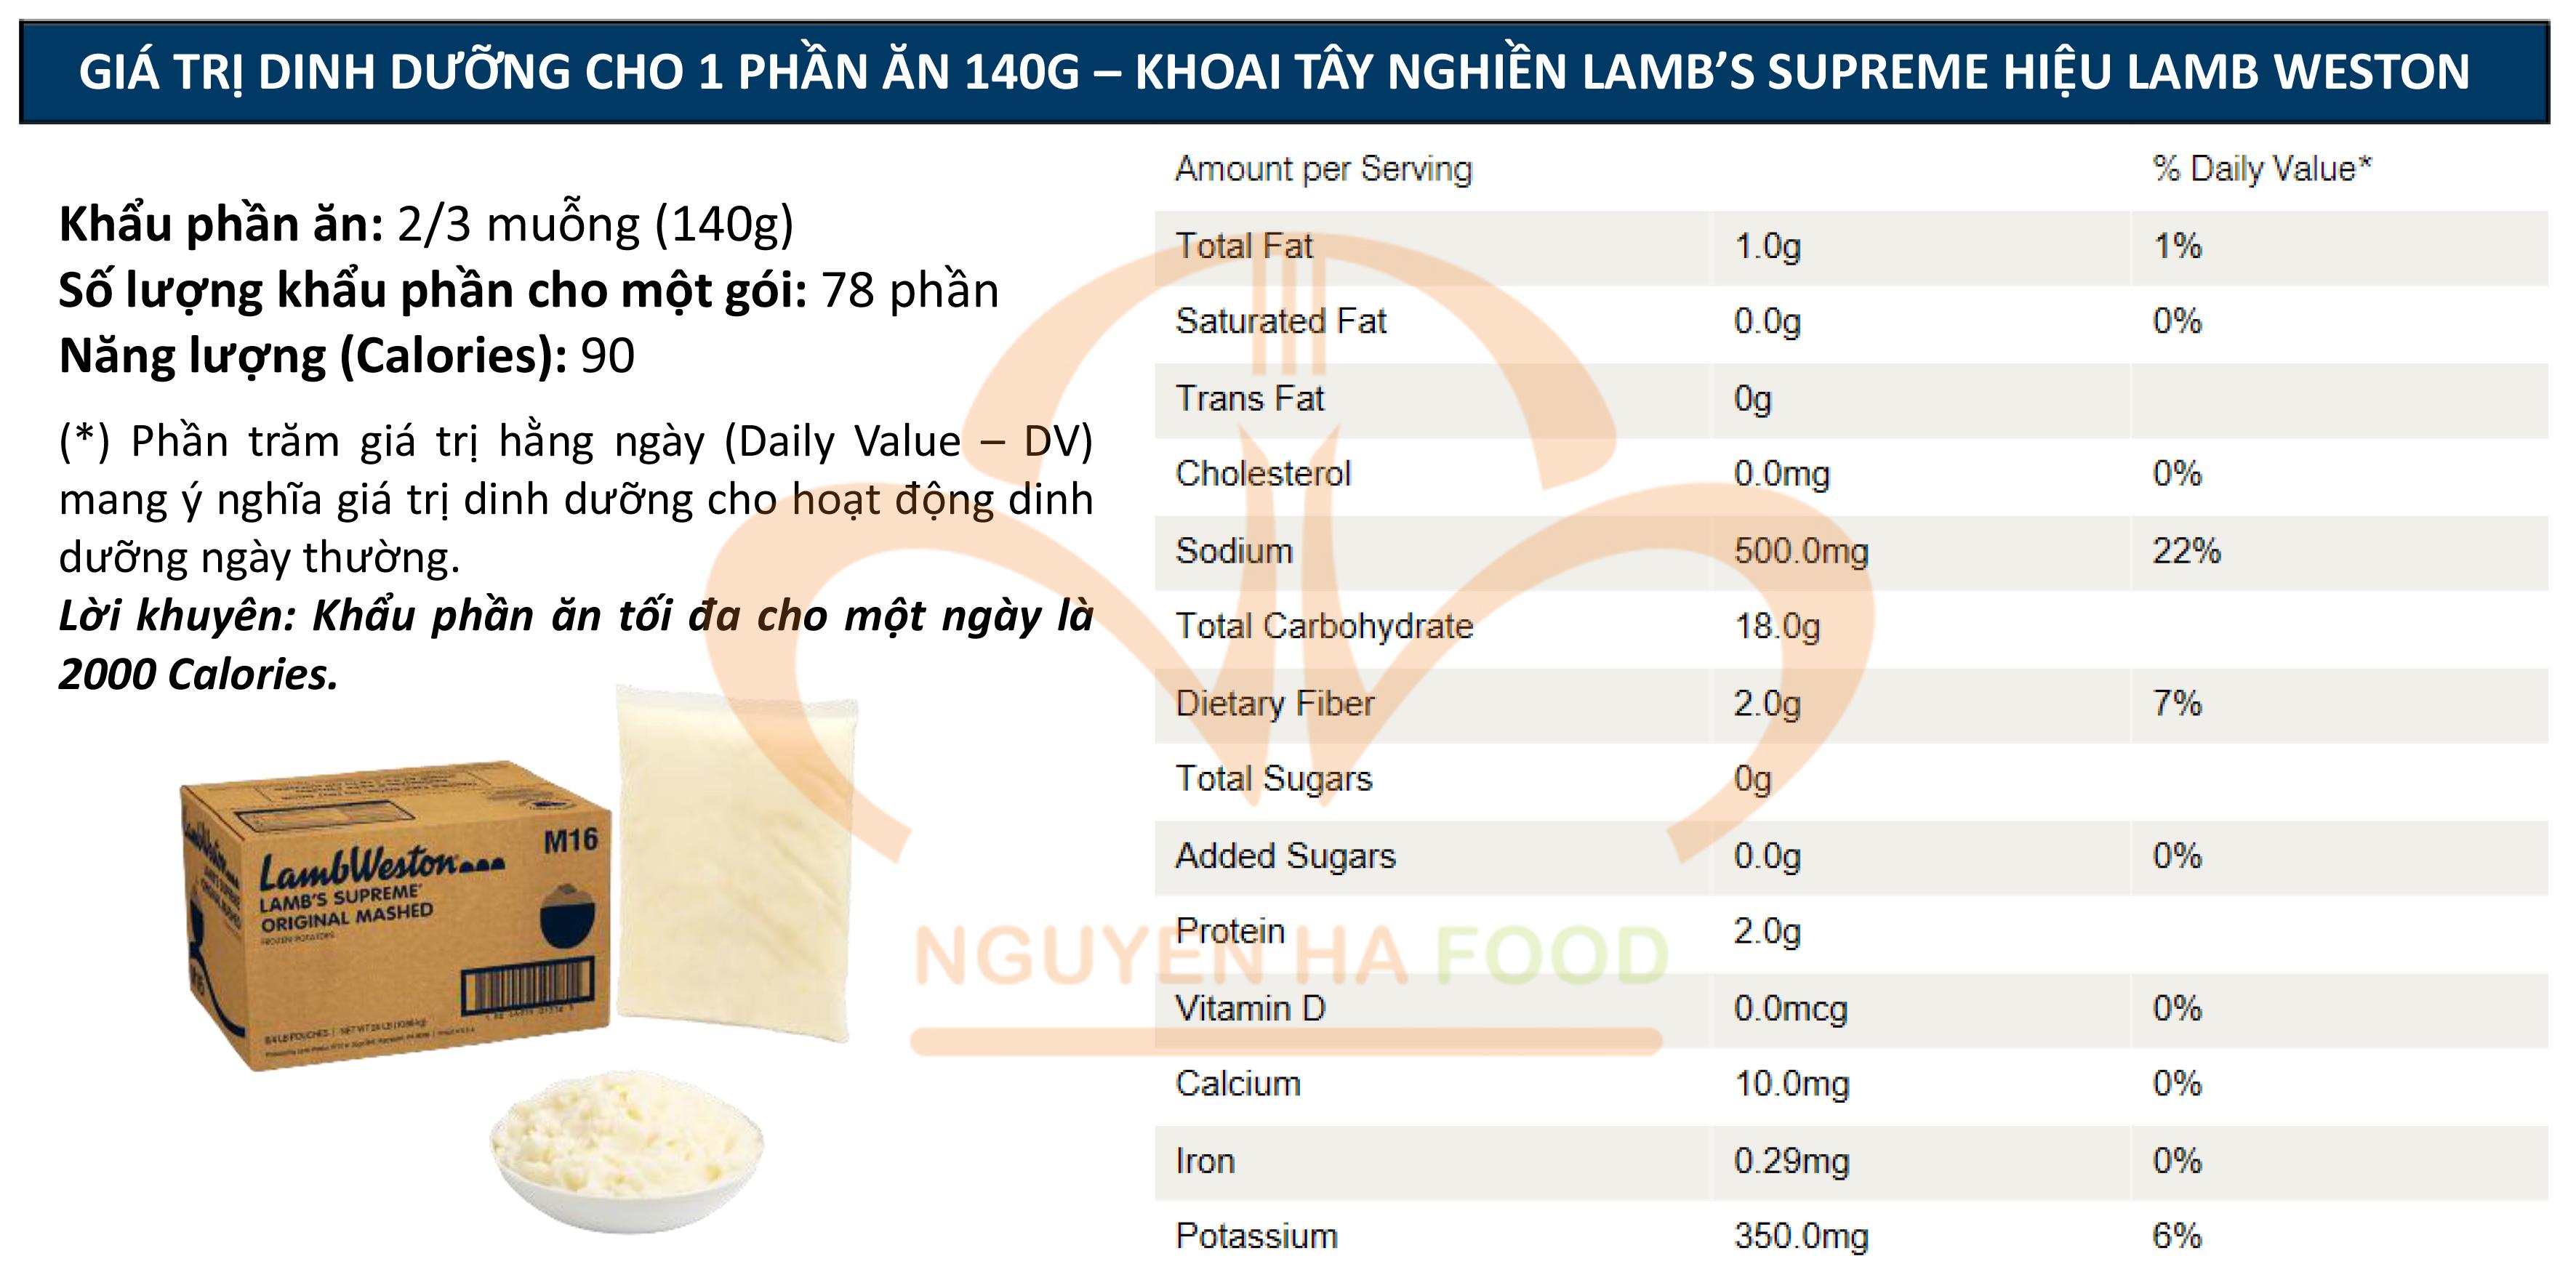 GIA TRI DINH DUONG KHOAI TAY NGHIEN LAMB'S SUPREME LAMB WESTON NGUYEN HA FOOD